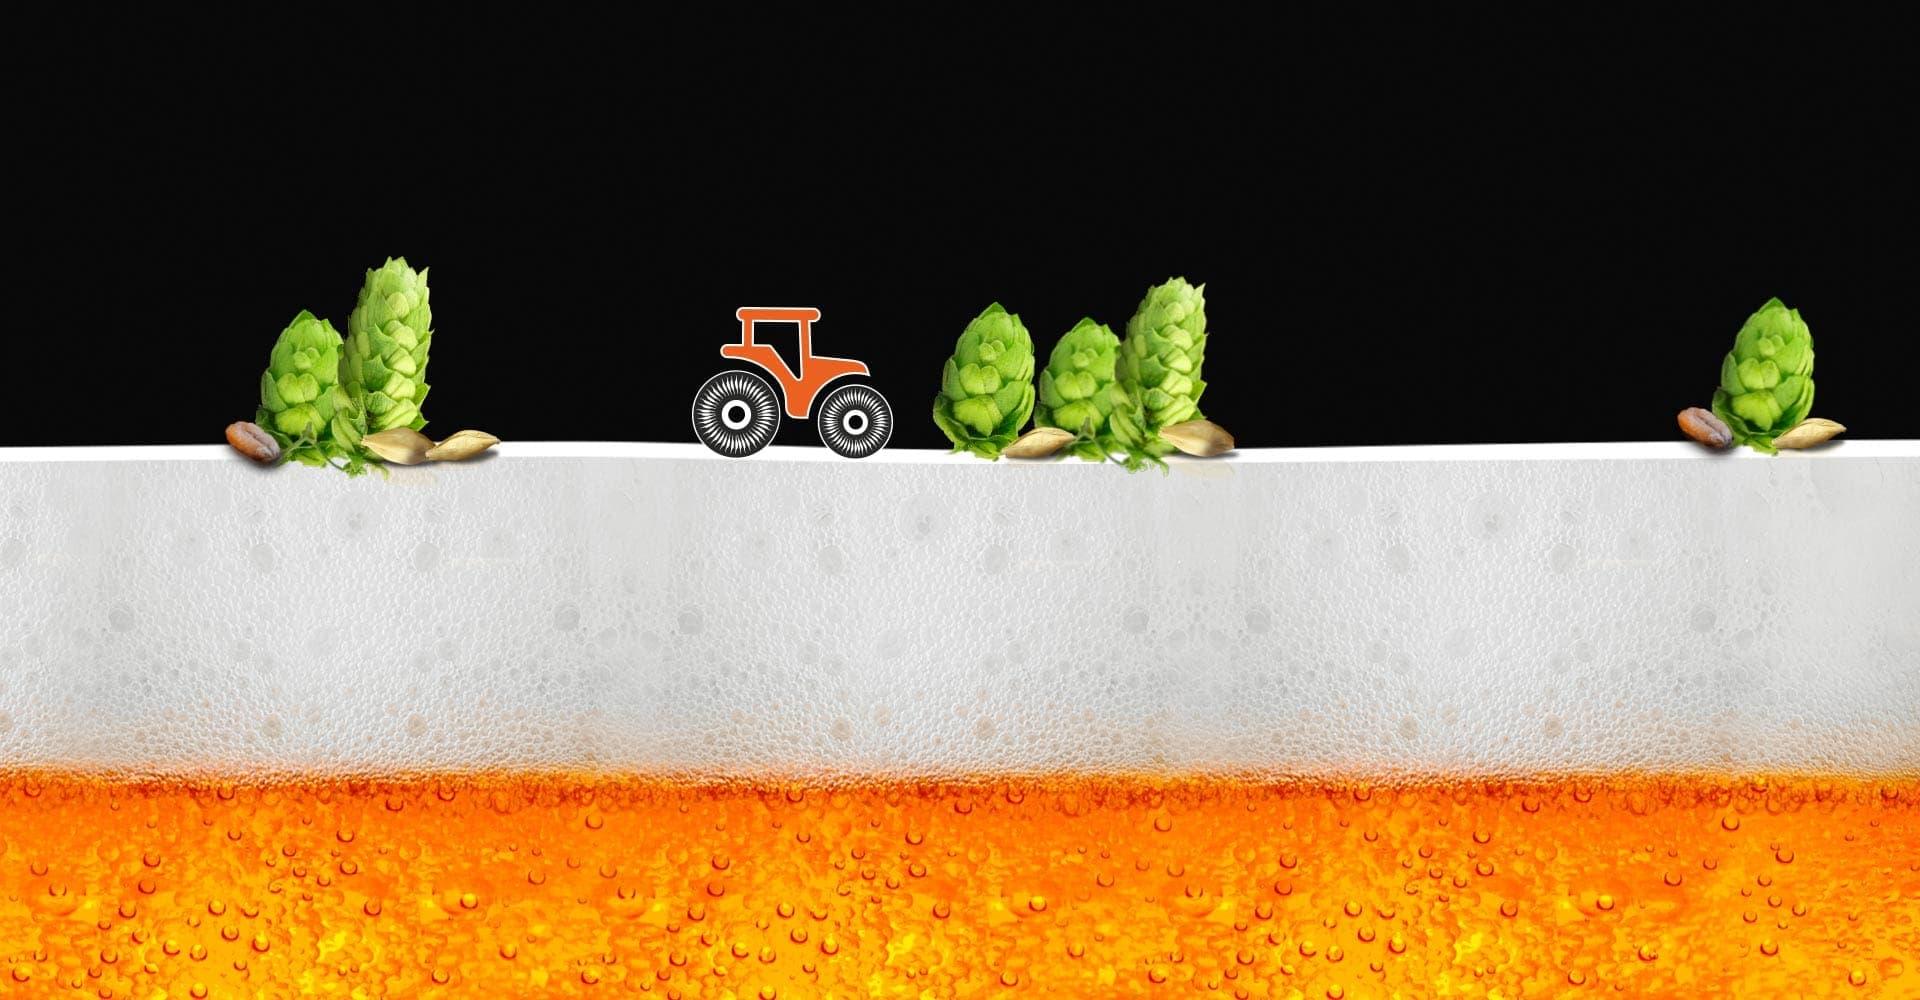 https://www.birrificiomarduk.com/wp-content/uploads/2020/06/06-marduk-brewery-agricoltura-filiera-materie-prime-birrificio-birre.jpg